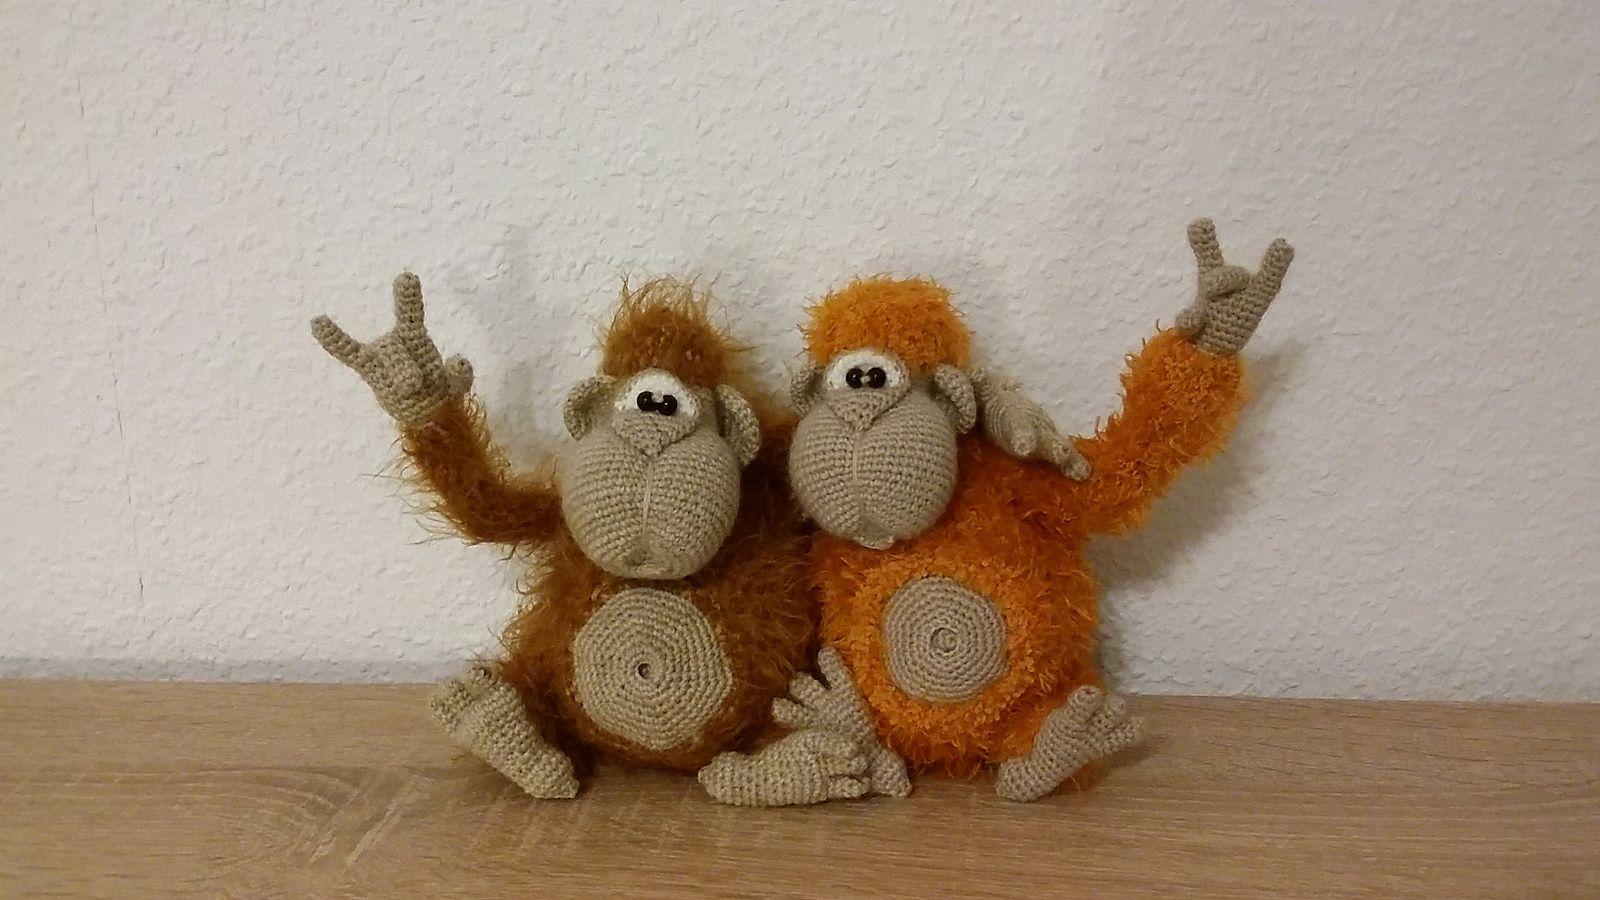 Crochet amigurumi monkeys by Zalja